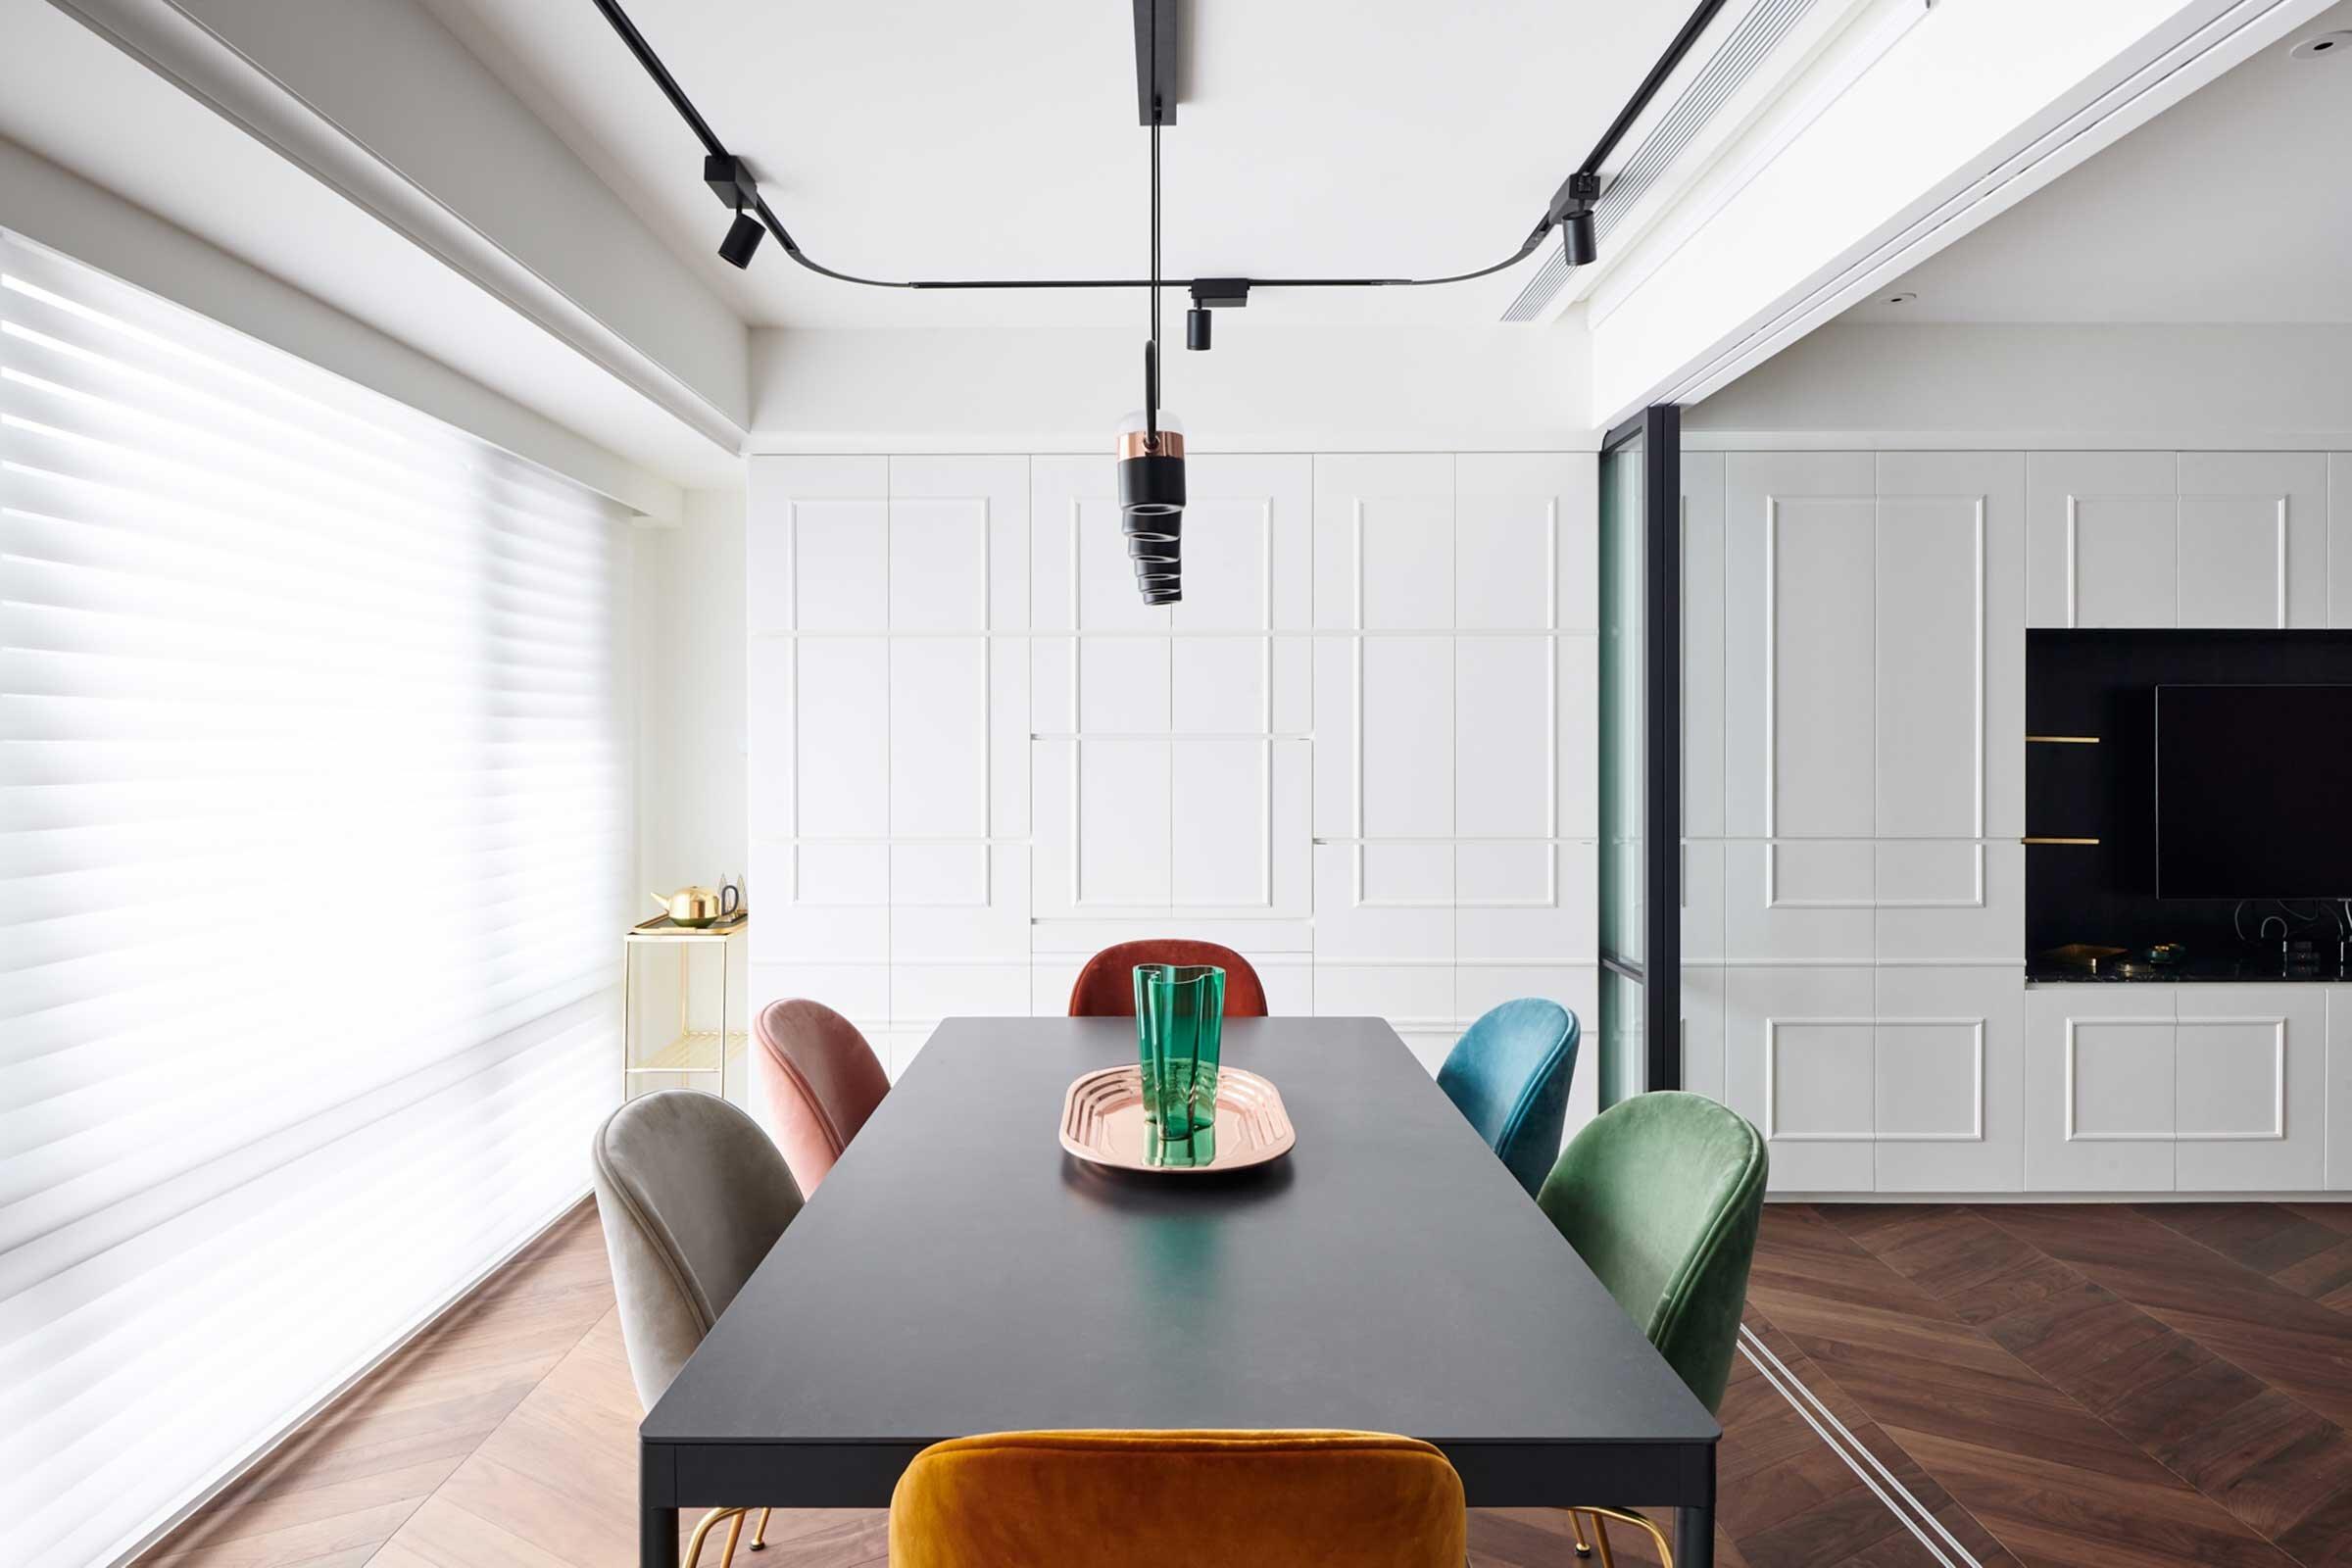 Chen-Studio-Yi-Hsiang-Chao-Architects_DSC0687@0,25x.jpg